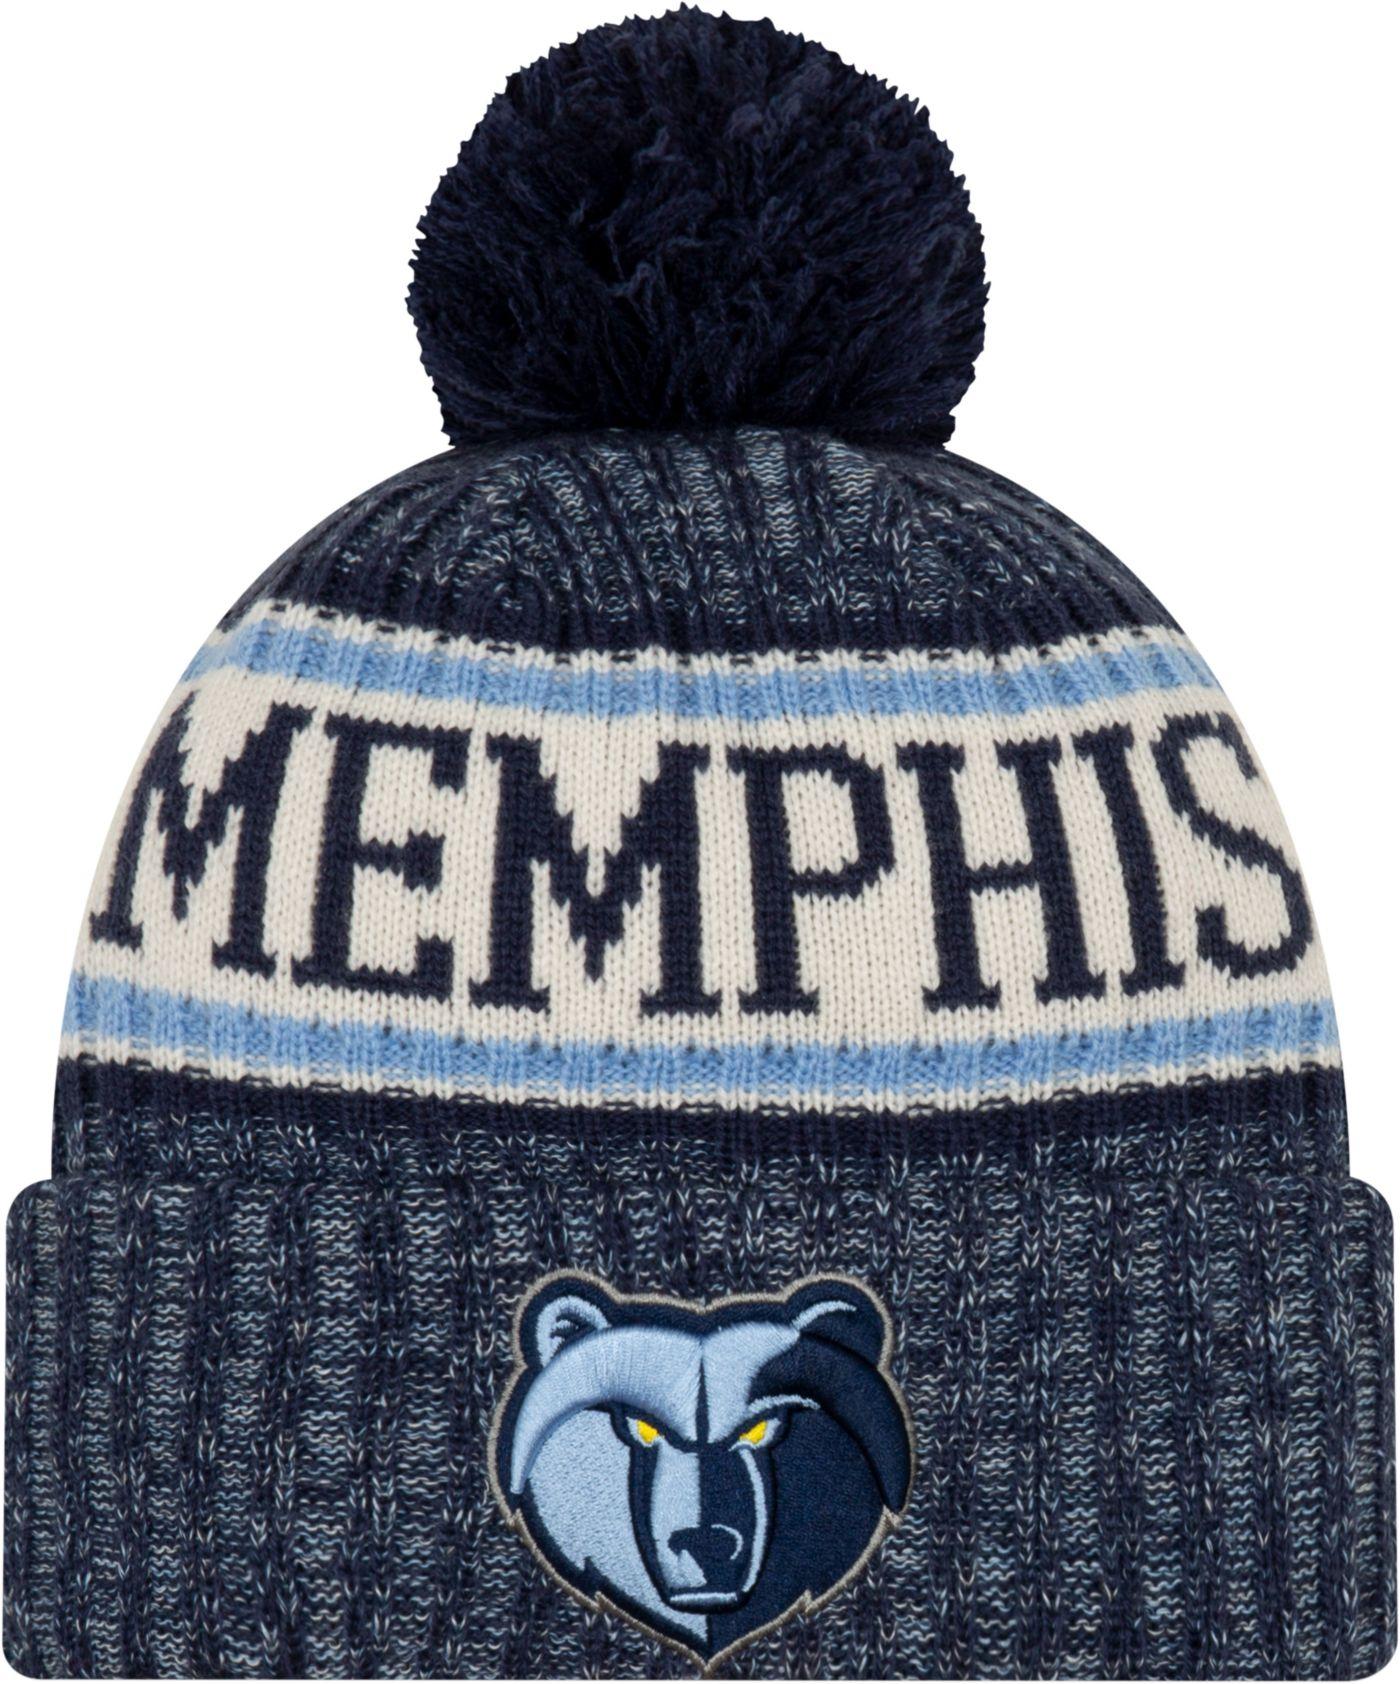 New Era Men's Memphis Grizzlies Sports Knit Hat